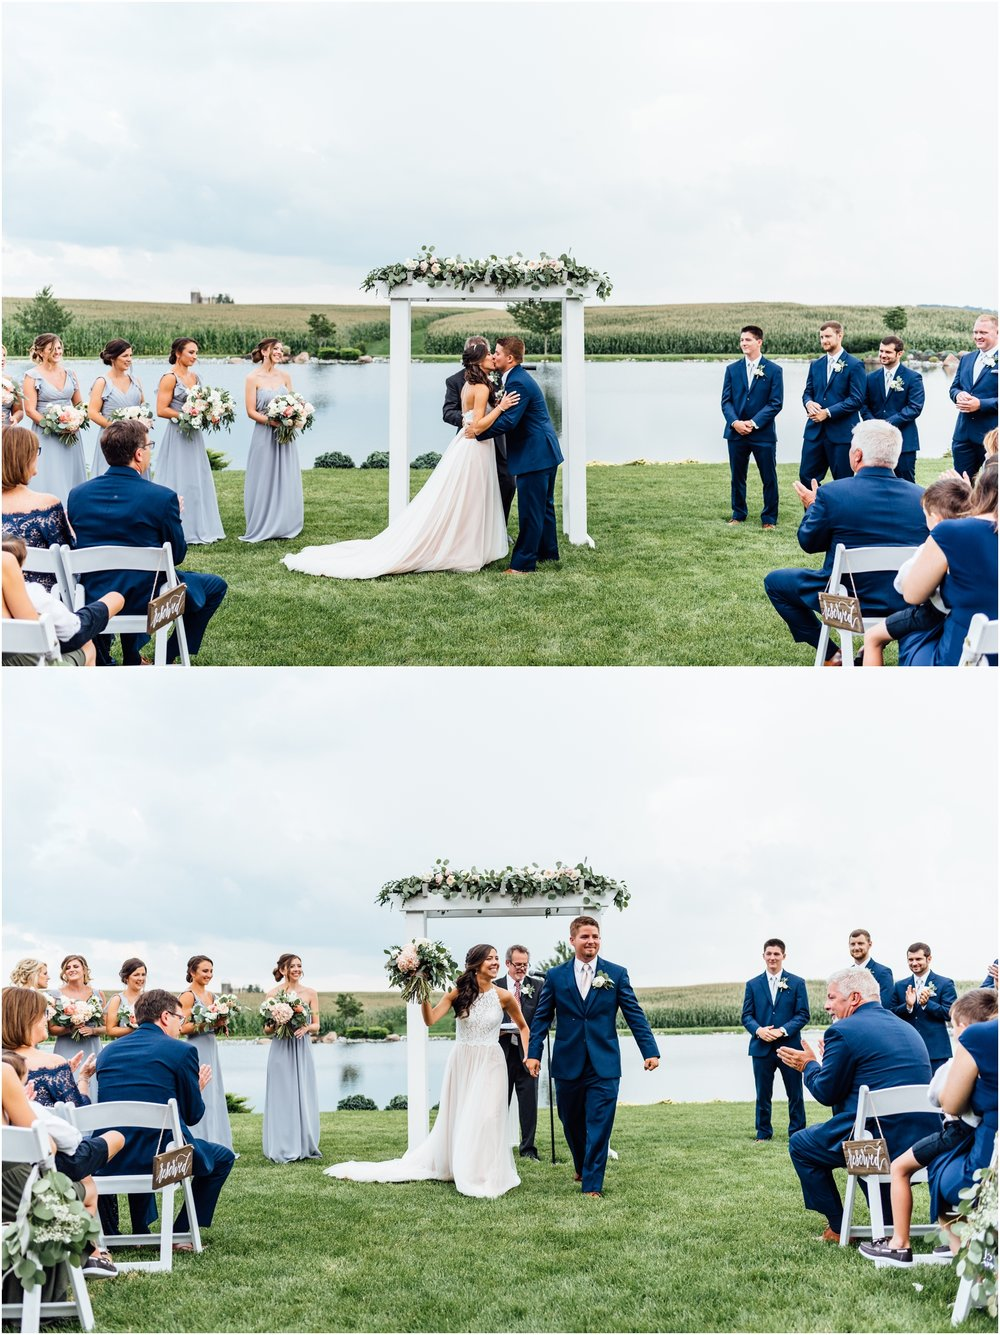 Steph&Bryan_Lancaster_wedding_farm_0519.jpg